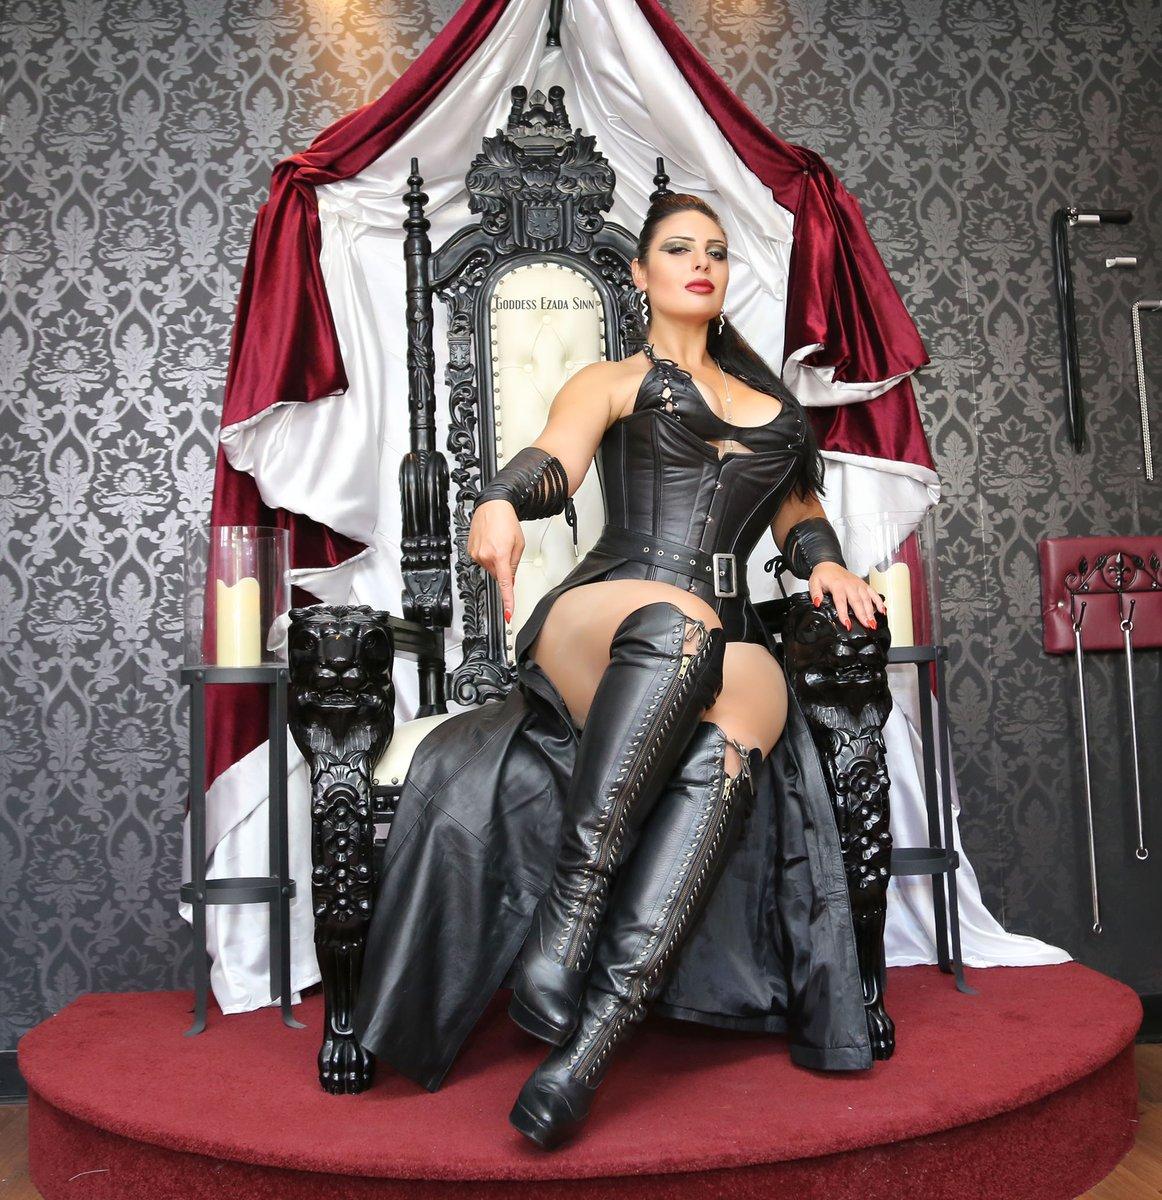 Tv mistress